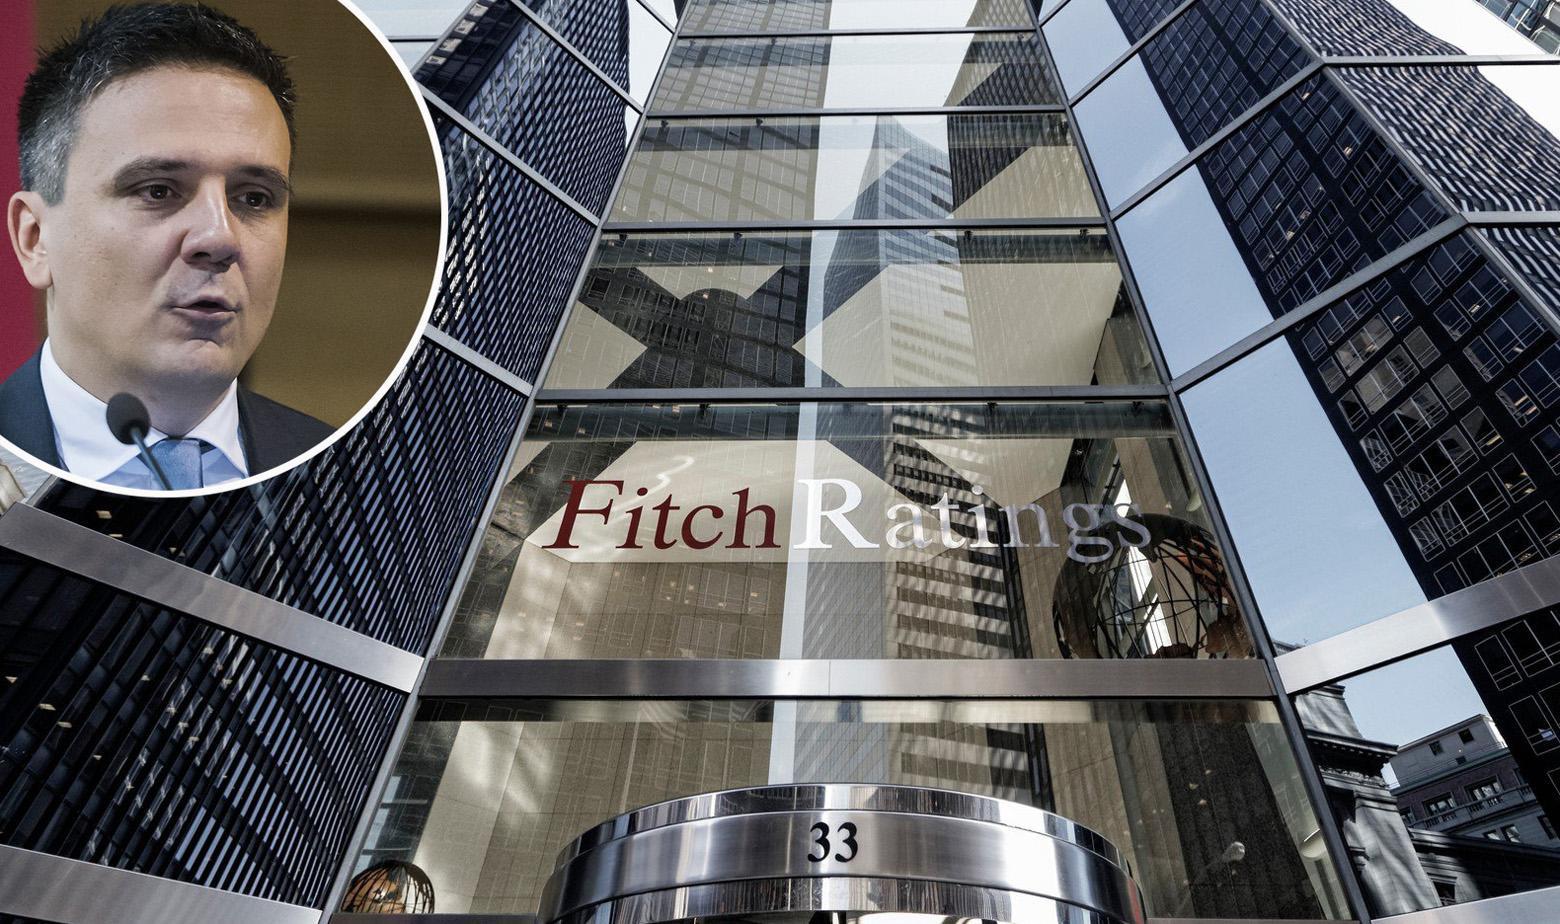 Zgrada kreditne agencije Fitch i Hrvoje Stojić u krugu